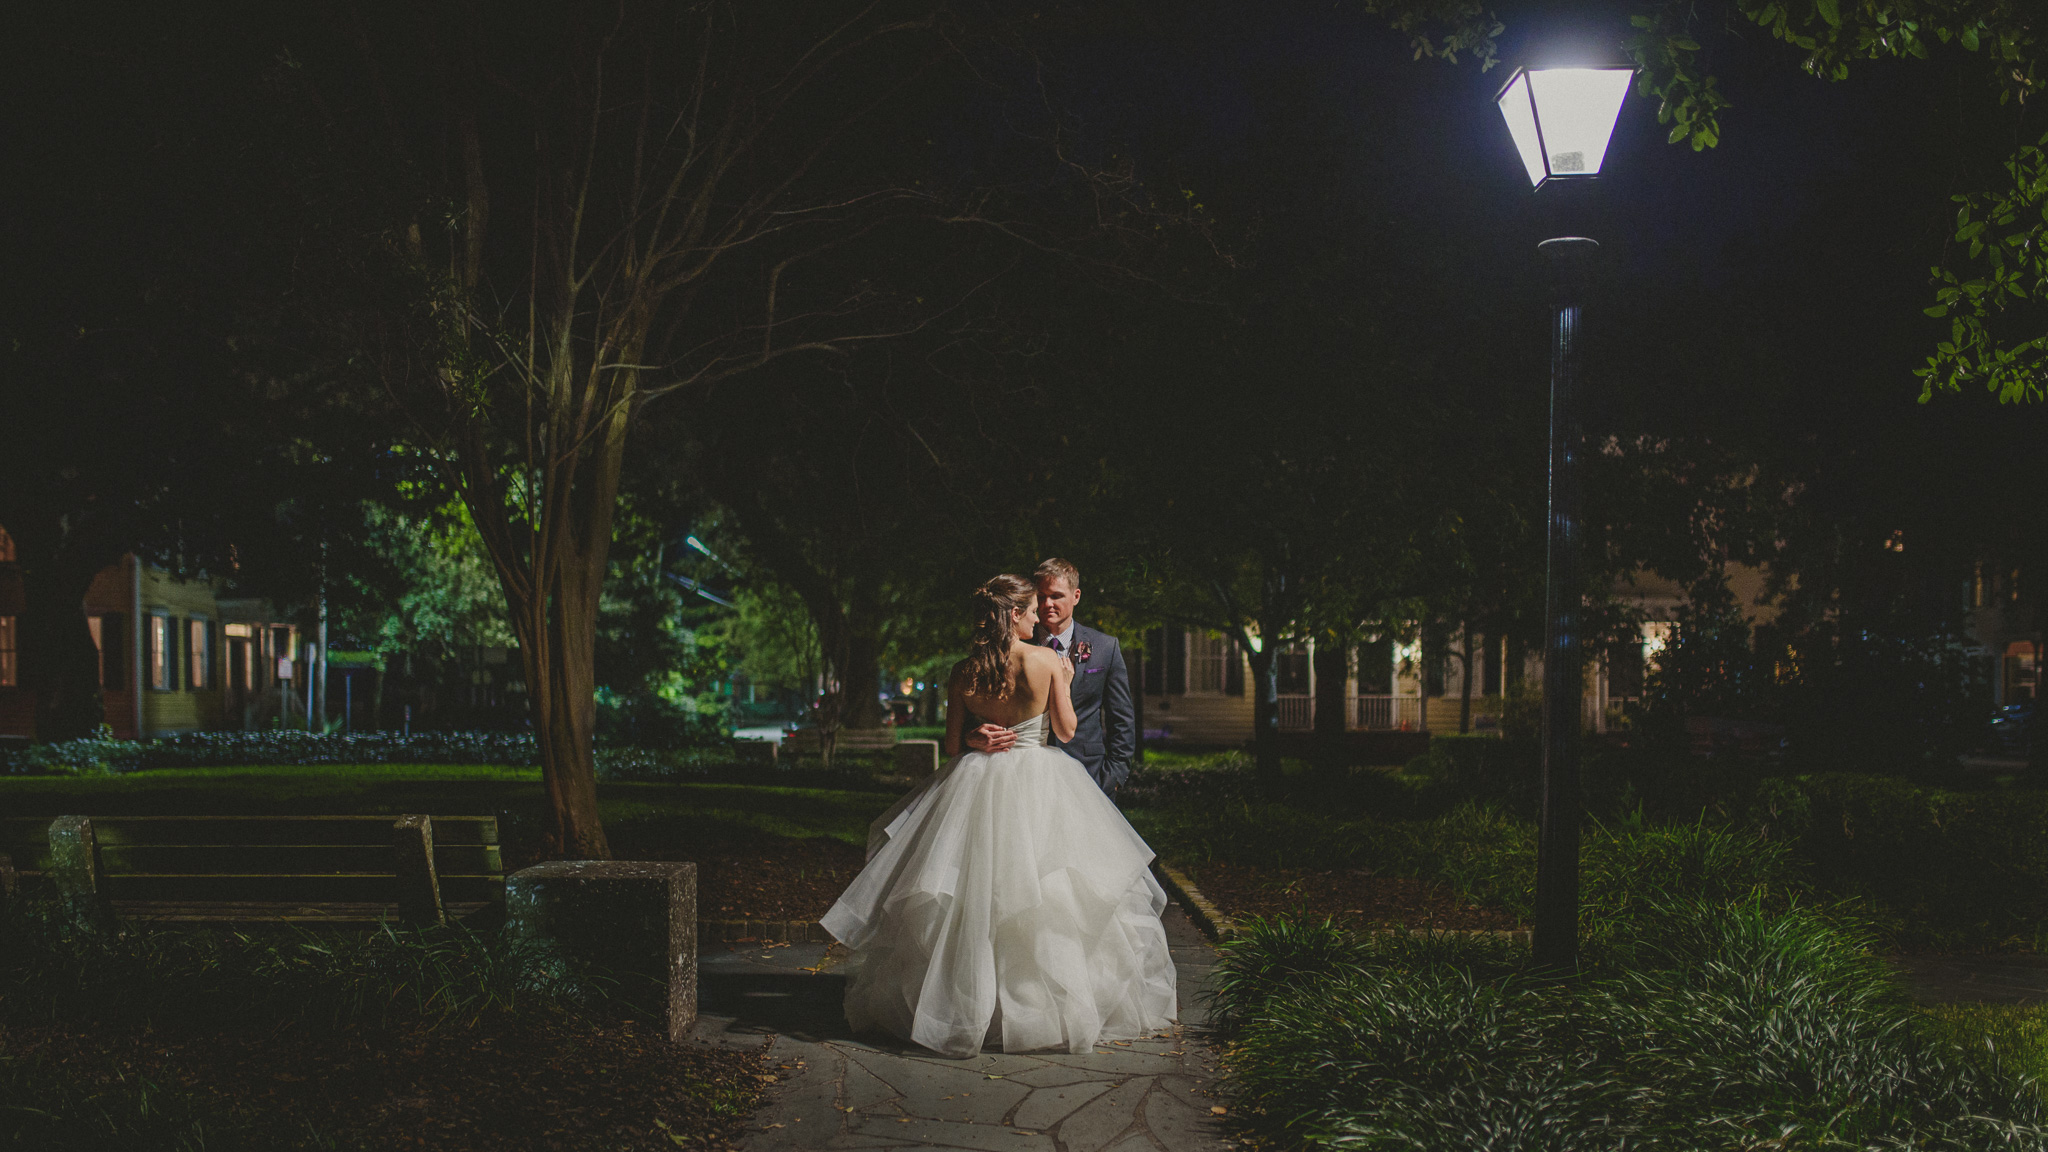 Savannah Wedding - Bride and Groom at night